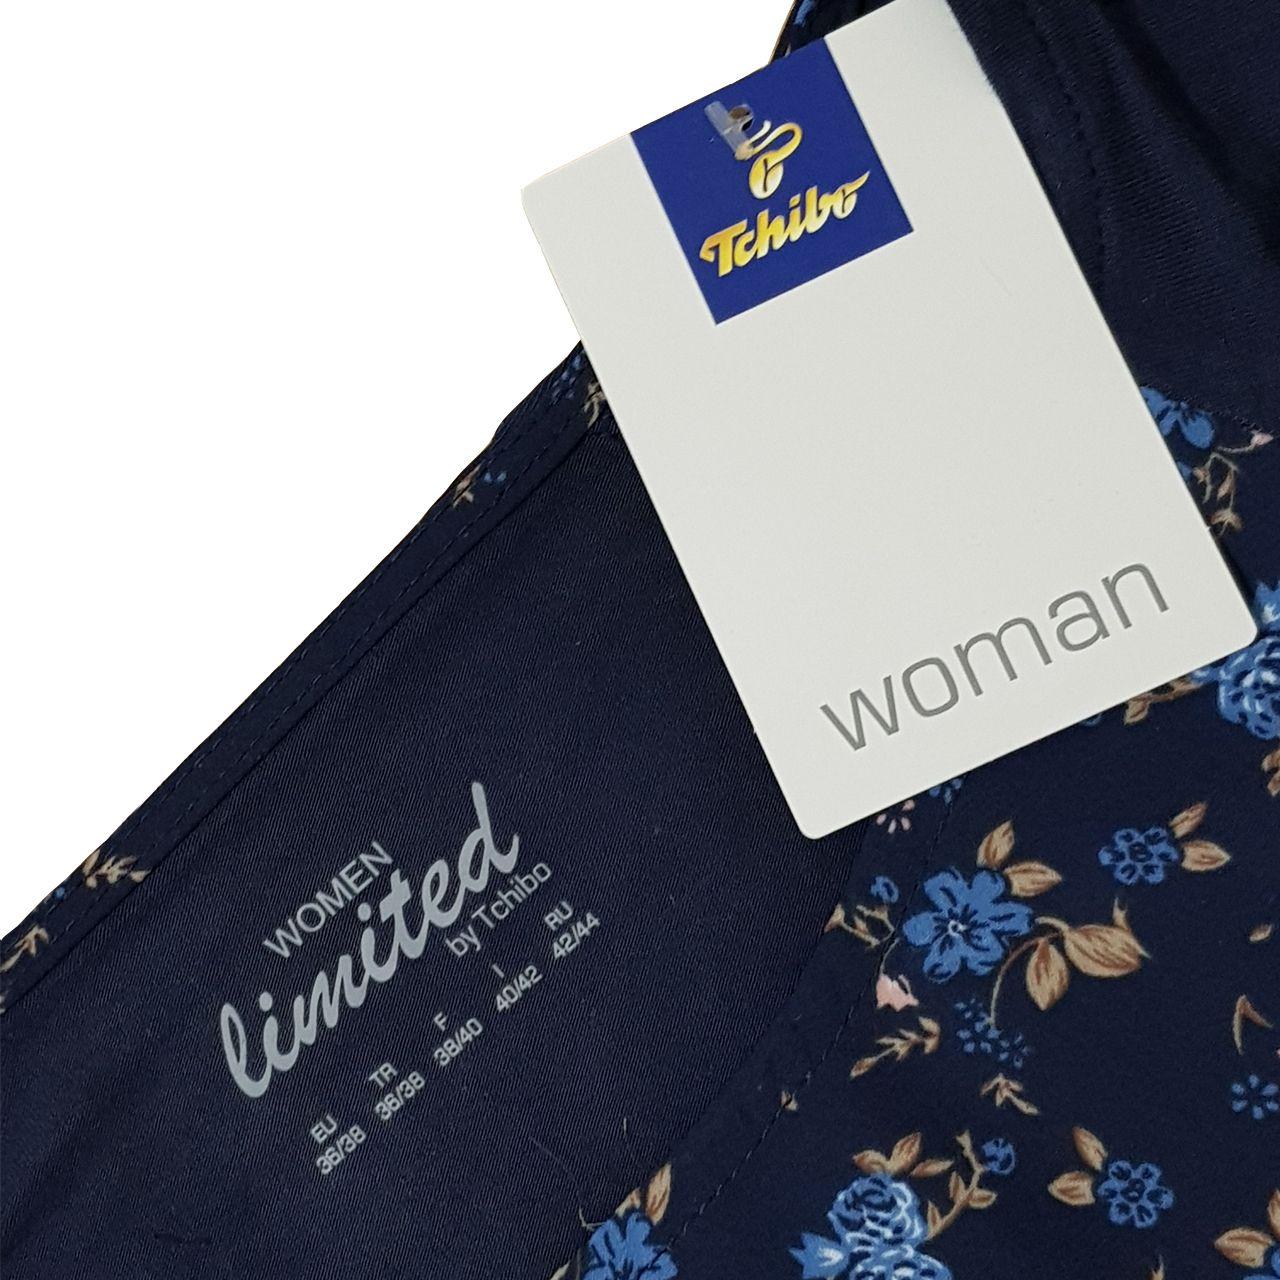 تیشرت زنانه چیبو مدل 349336 -  - 4